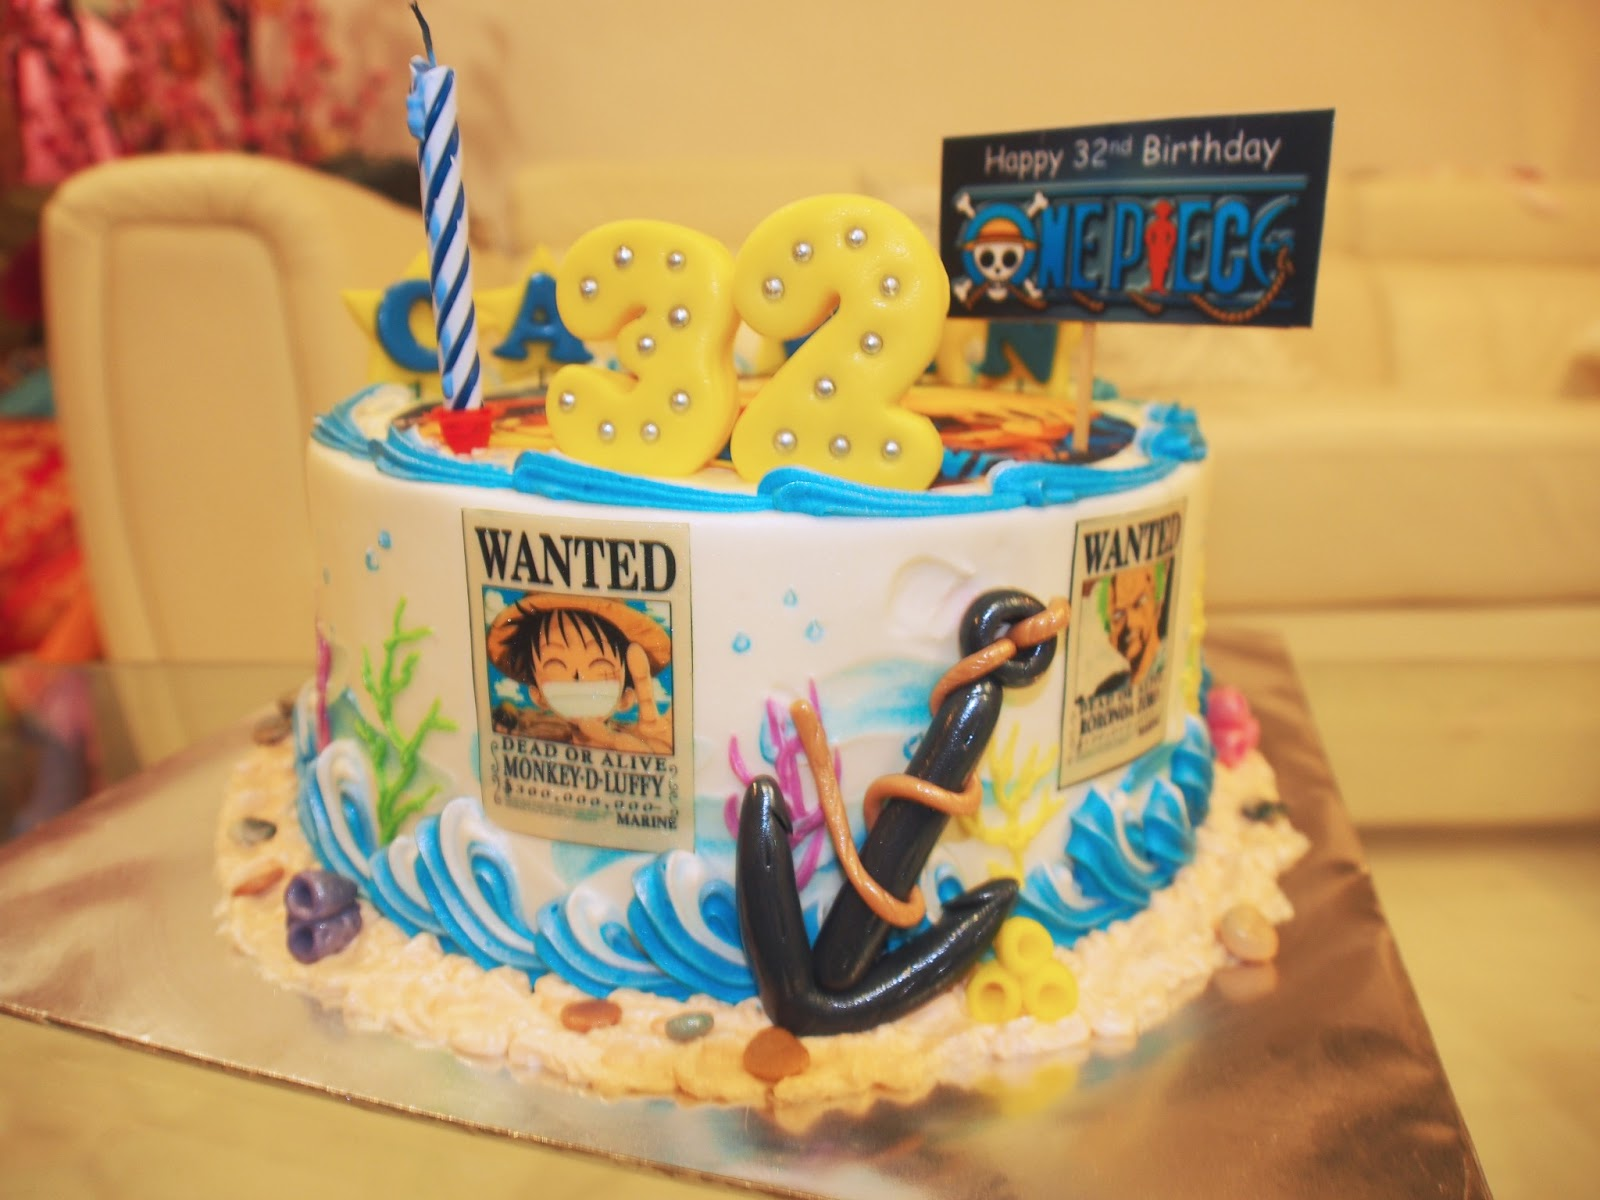 The Sensational Cakes Feedback Rainbow One Piece Cake Singapore